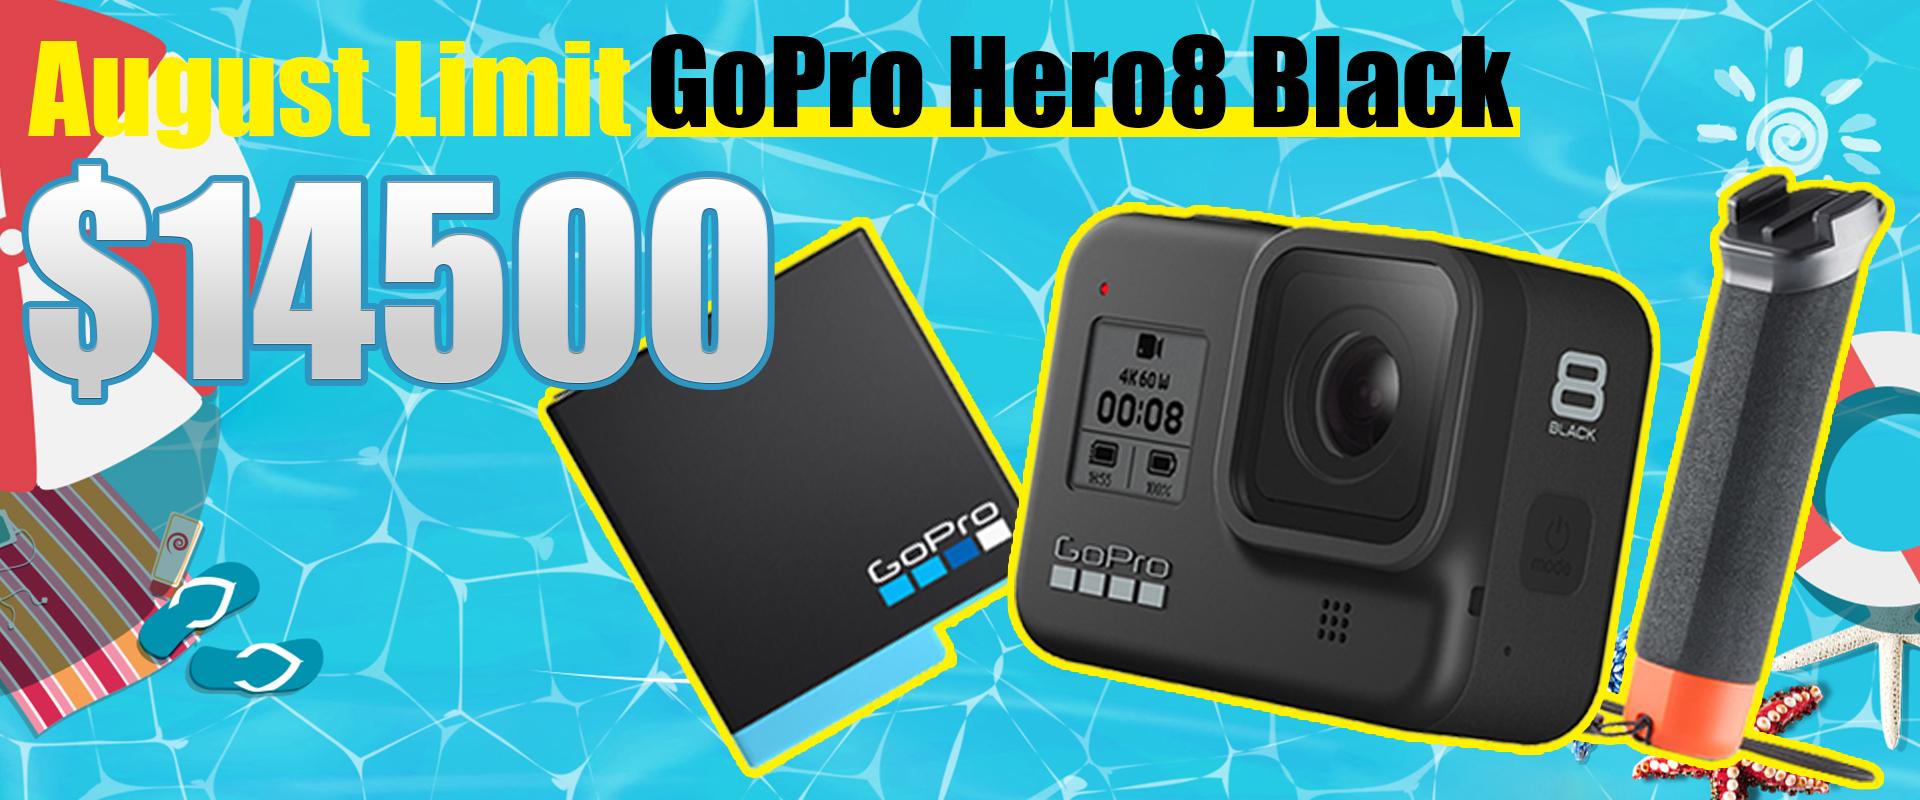 GoPro Hero8 買就送原廠電池+漂浮手把 價值$18000 特價$14500 數量有限